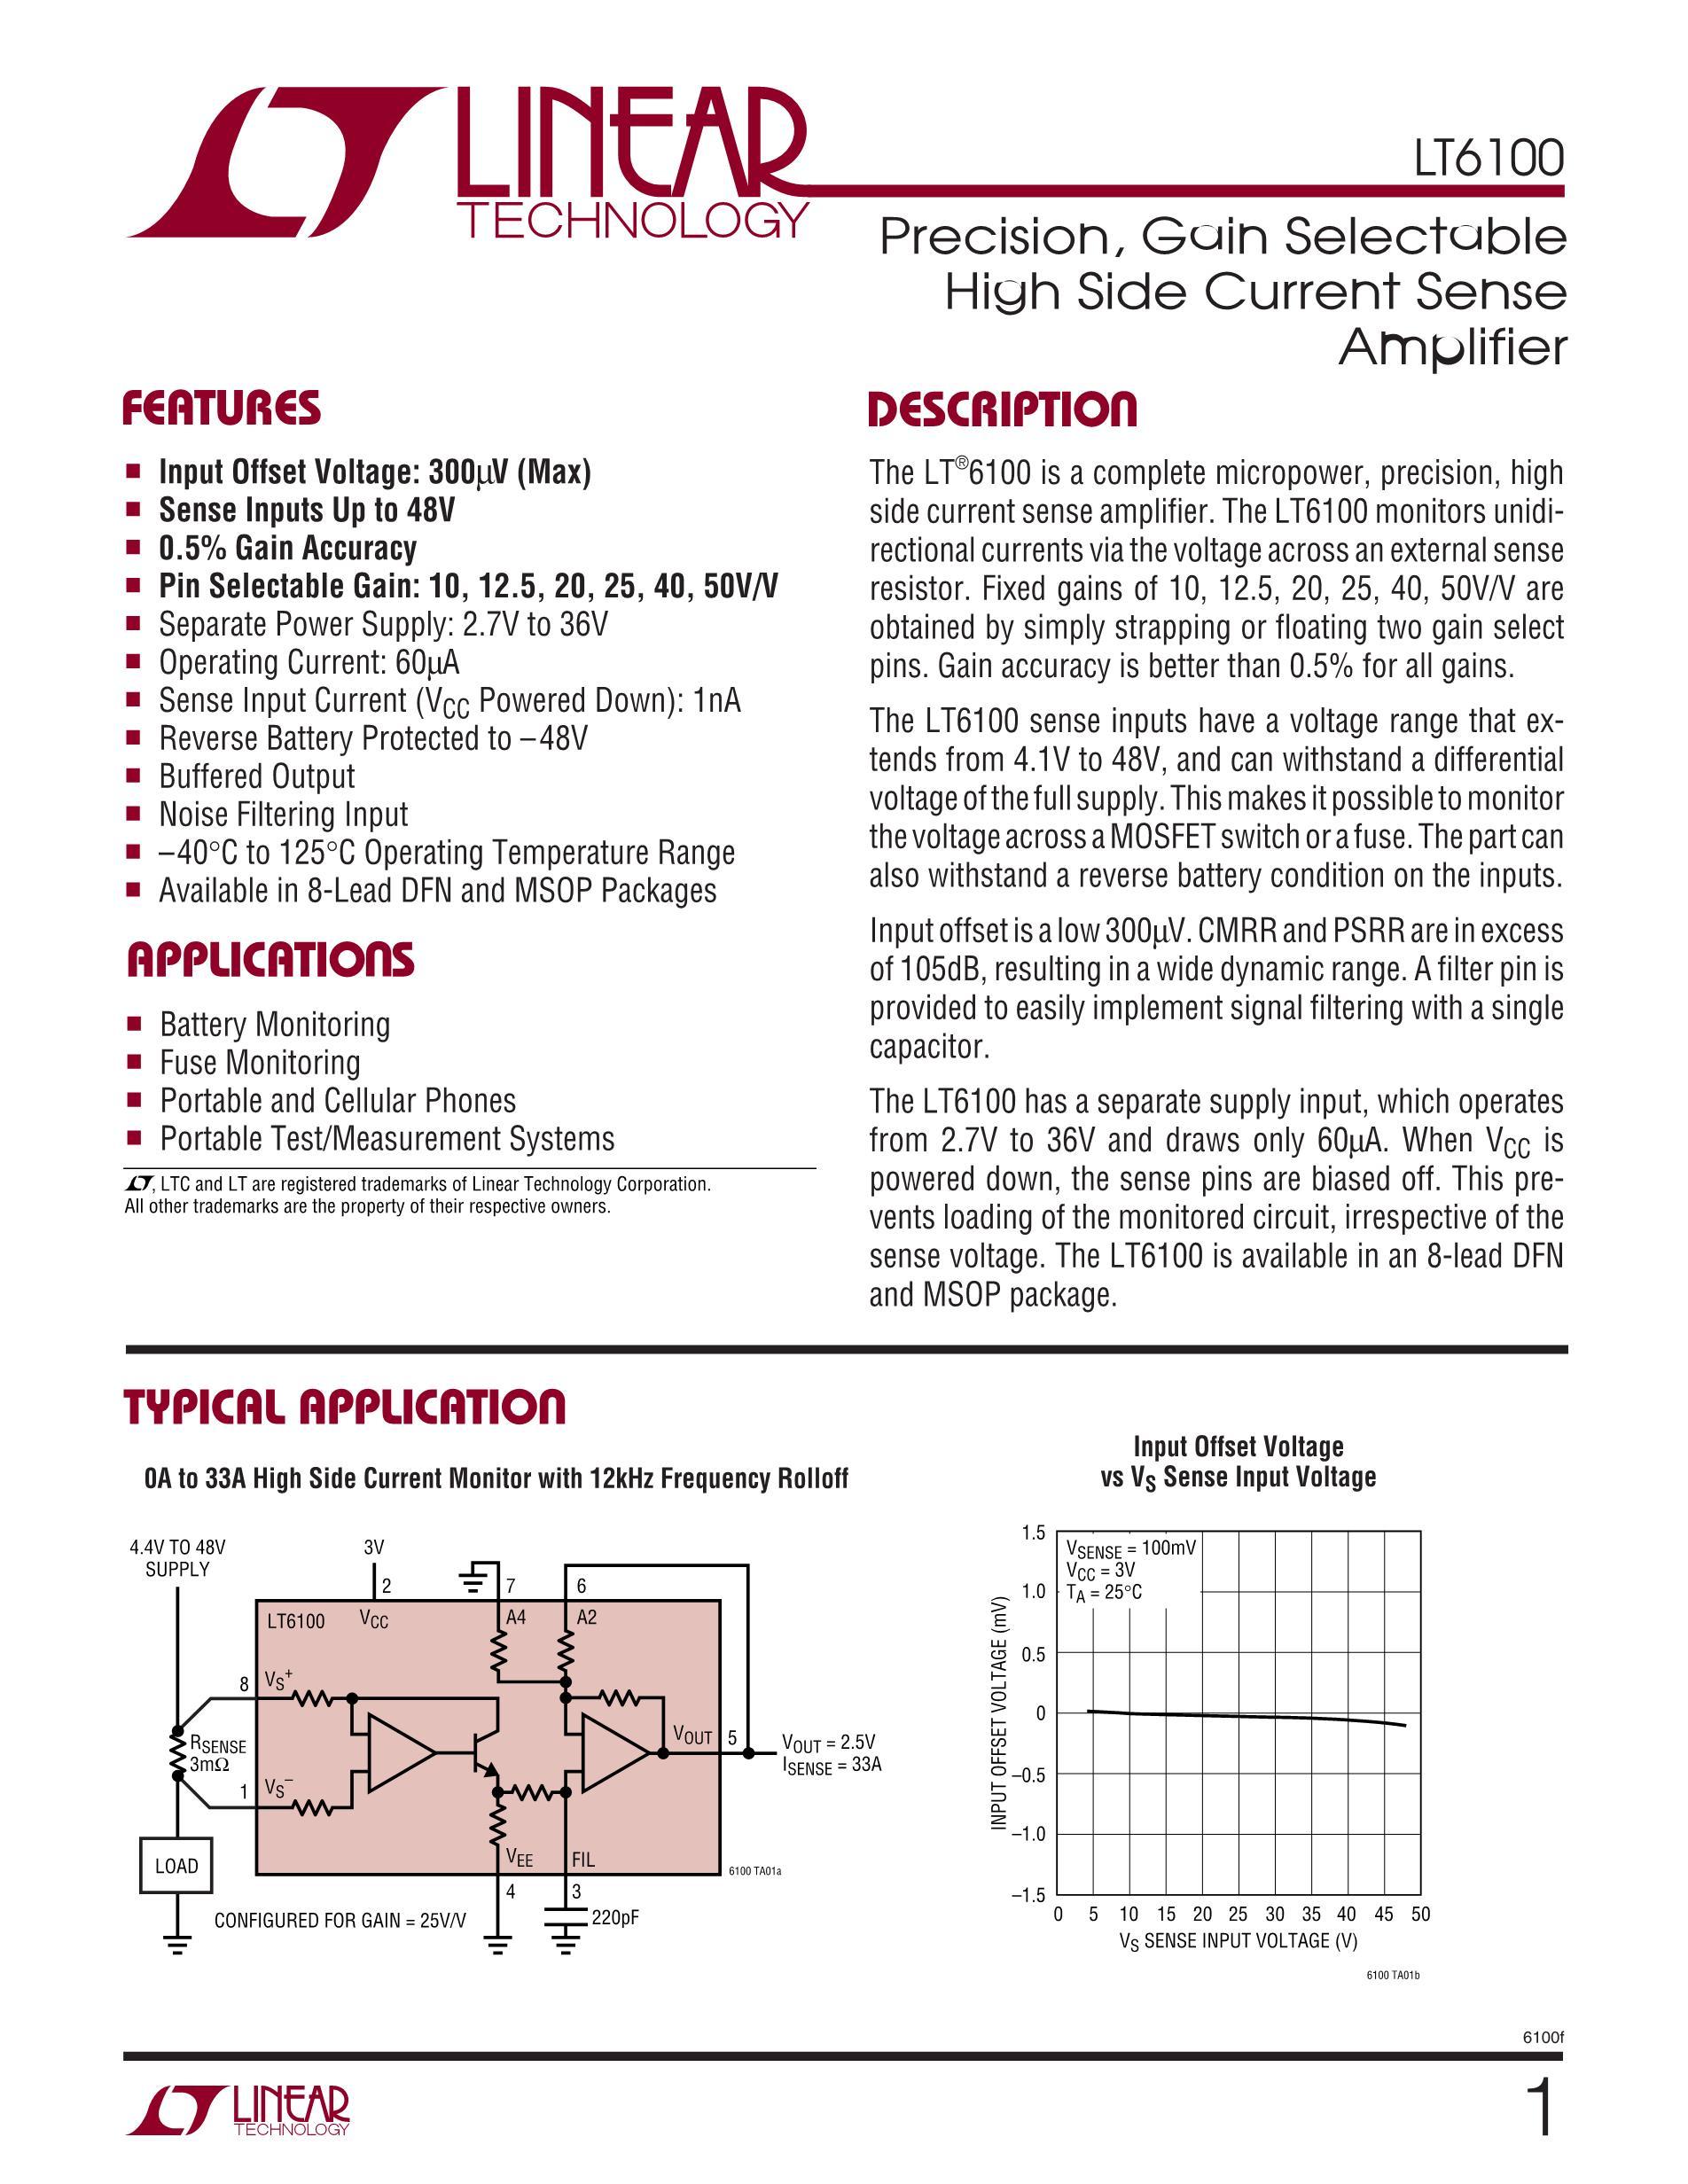 LT6108AIMS8-1#PBF's pdf picture 1